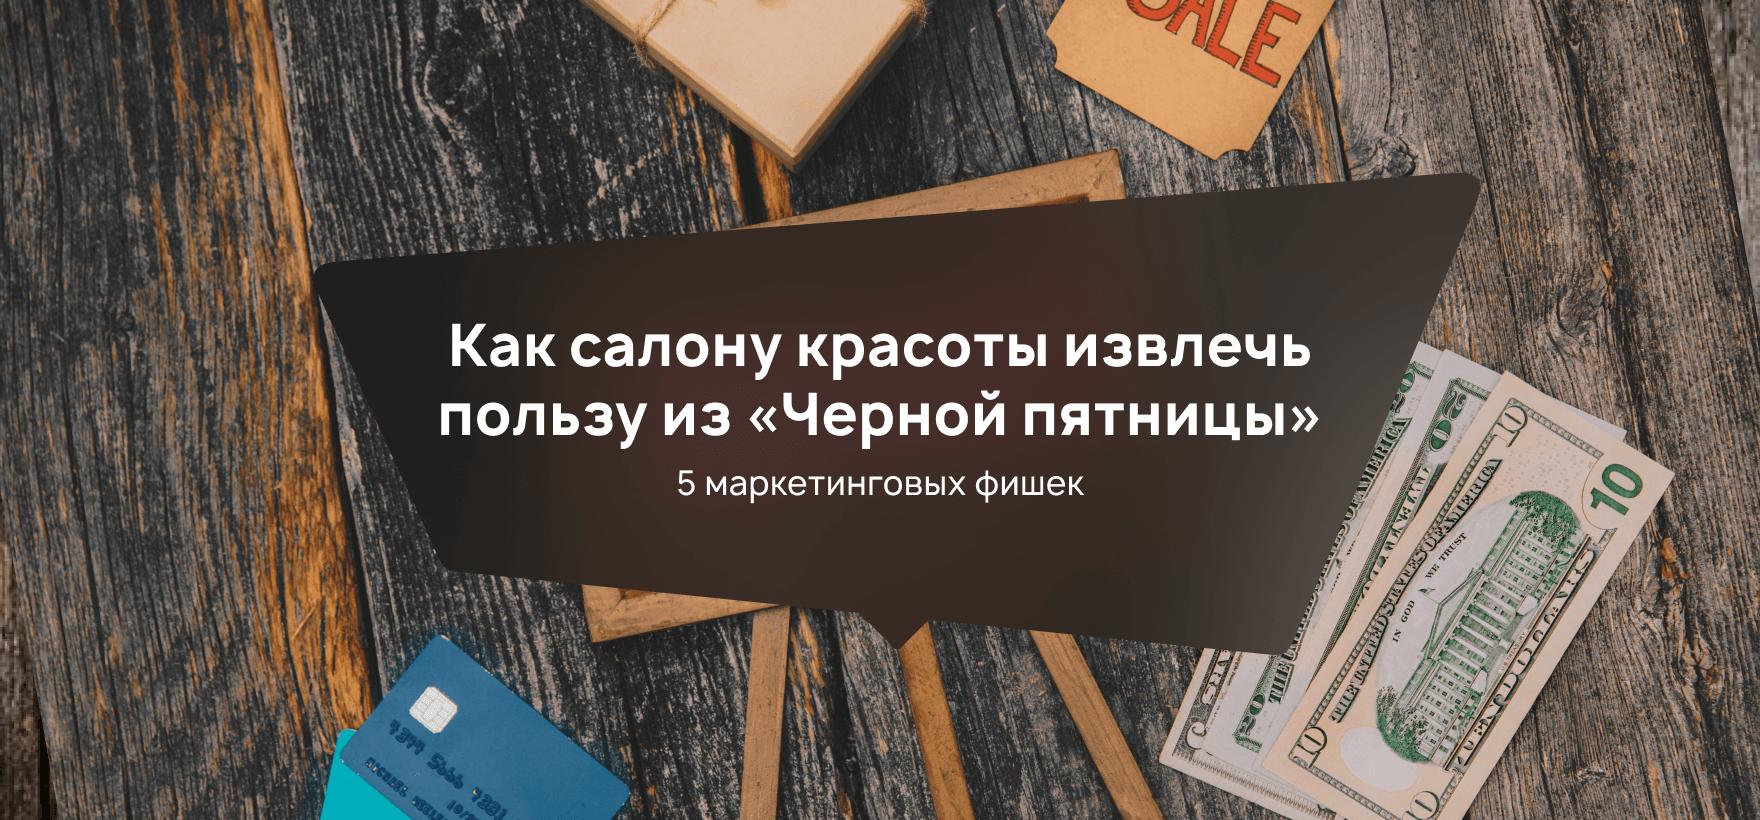 "<p class=""qtranxs-available-languages-message qtranxs-available-languages-message-en"">Sorry, this entry is only available in <a href=""https://beautyprosoftware.com/ru/blog/novogodnij-marafon-v-salone-krasoty-kak-pravilno-podgotovitsja/"" class=""qtranxs-available-language-link qtranxs-available-language-link-ru"" title=""Русский"">Russian</a>.</p>"